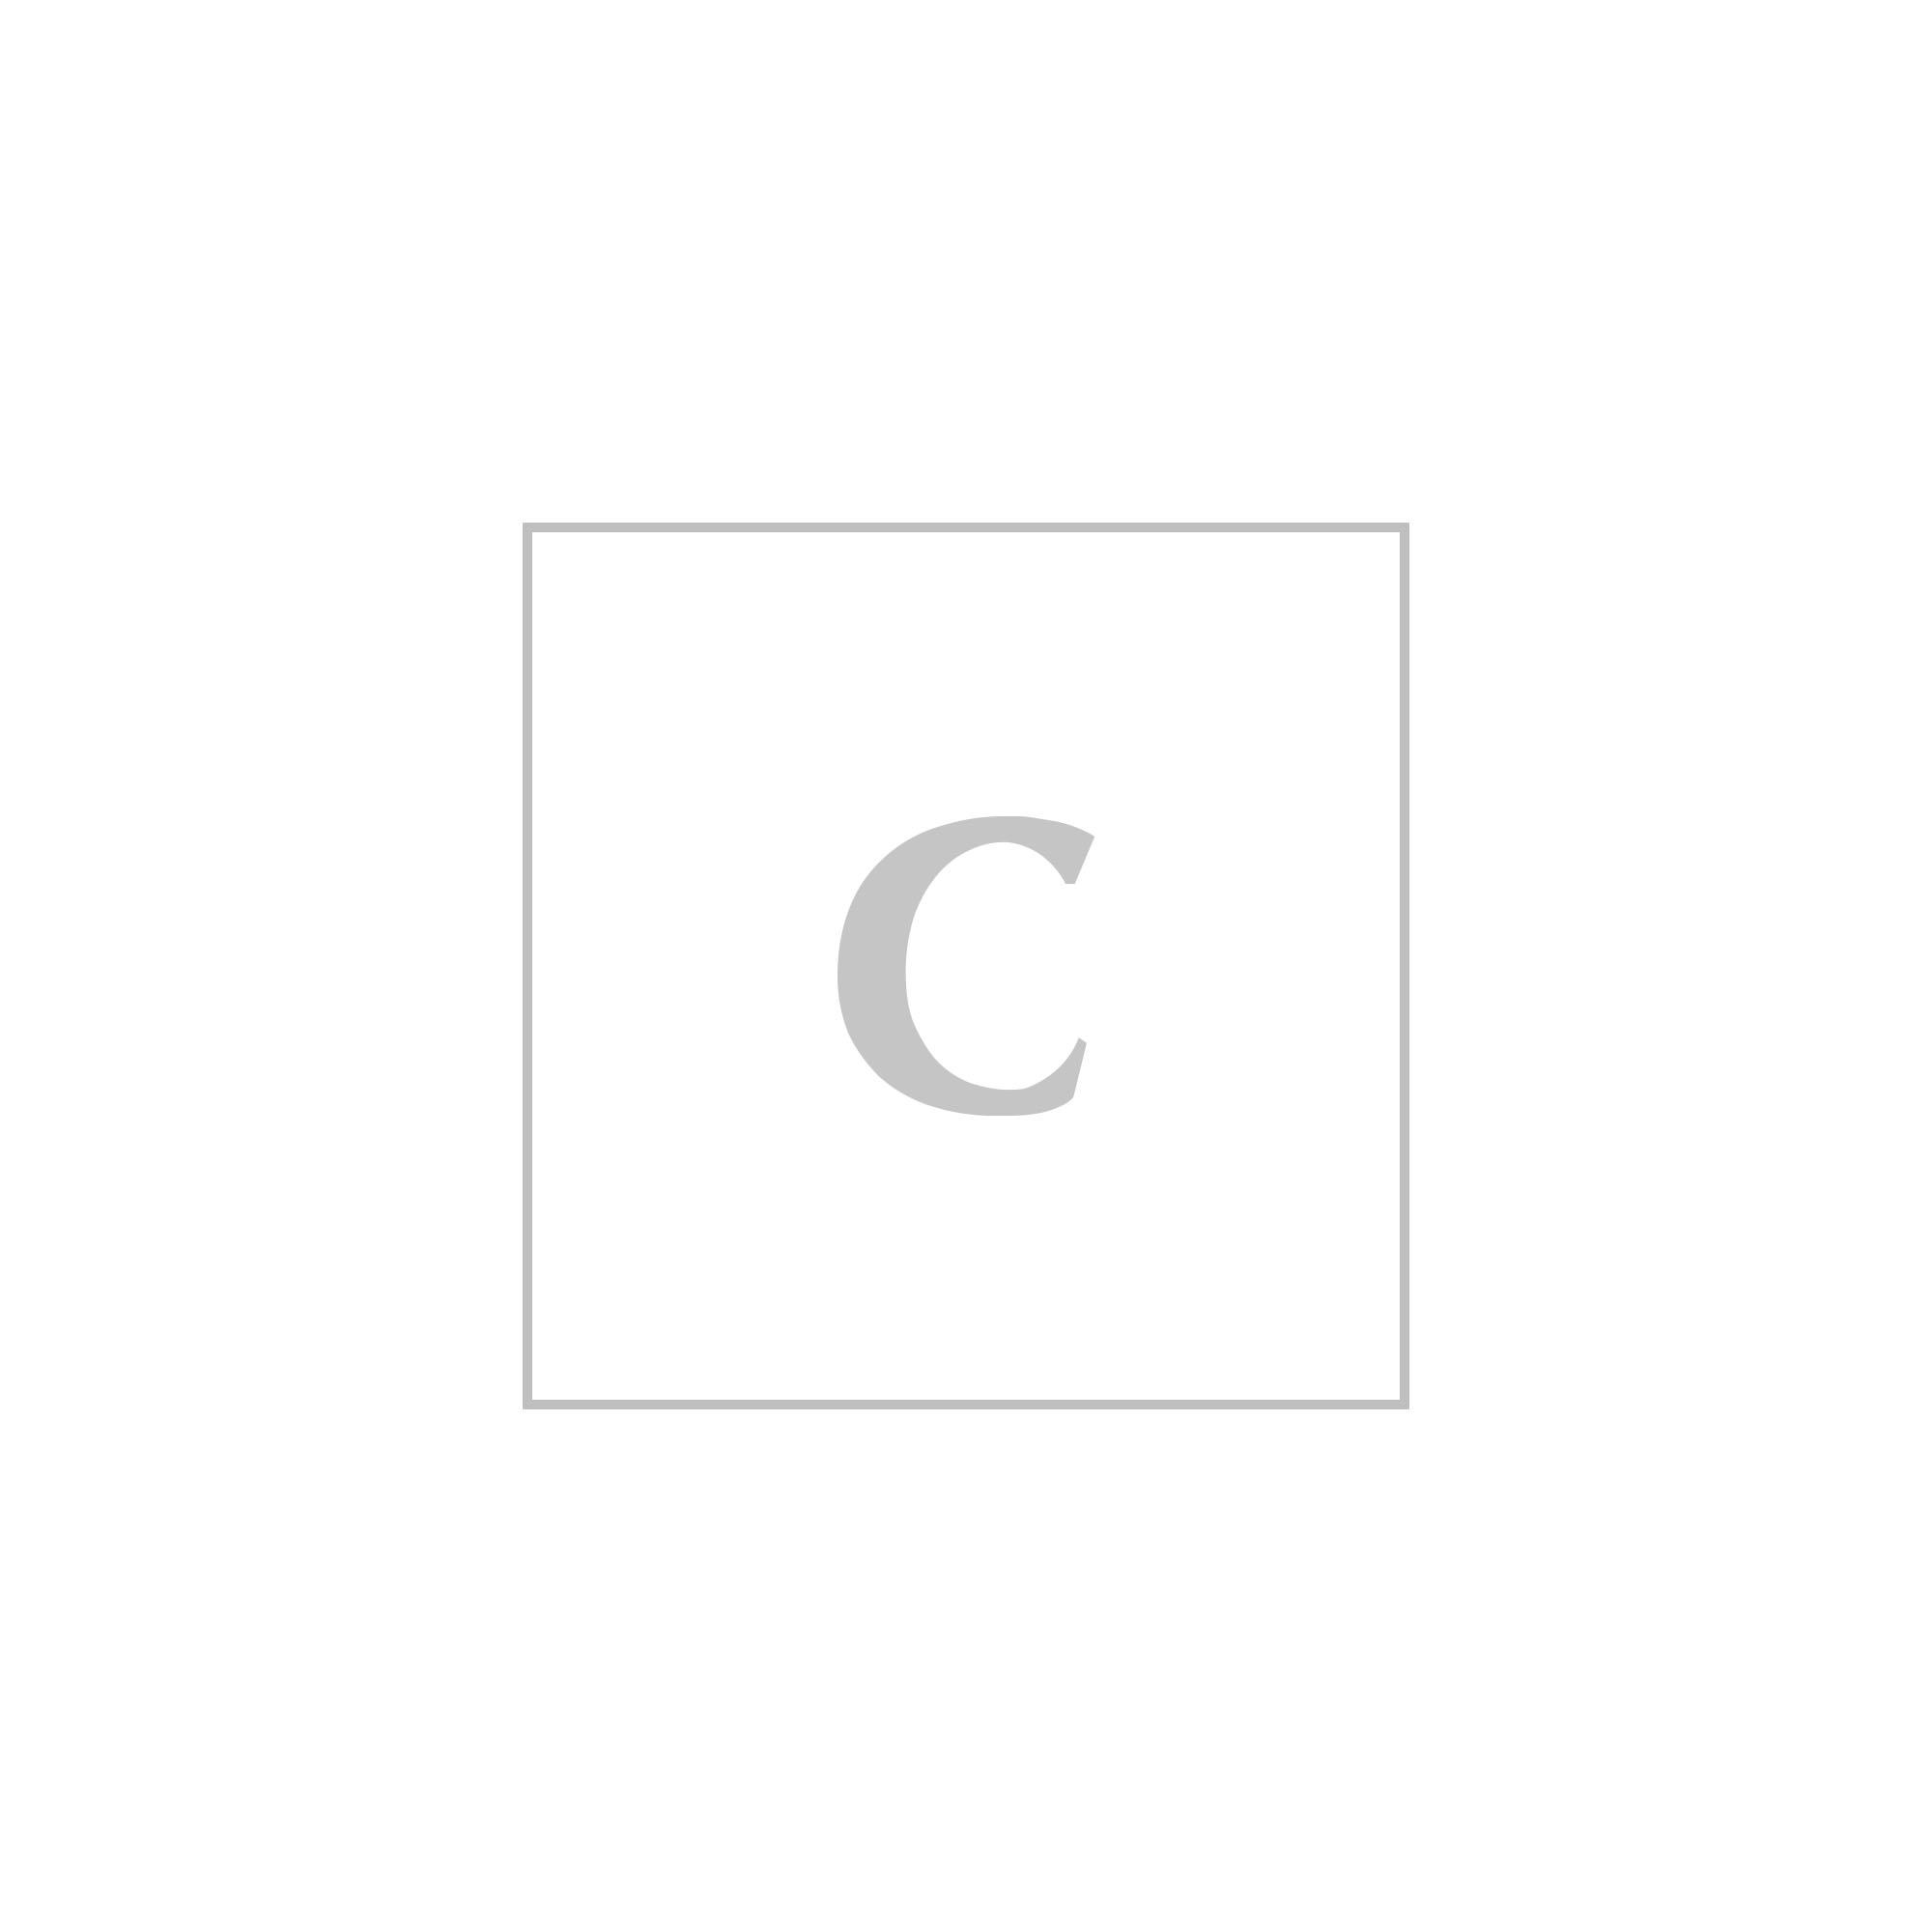 Dolce & gabbana borsa iphone vitello stampa dauphine